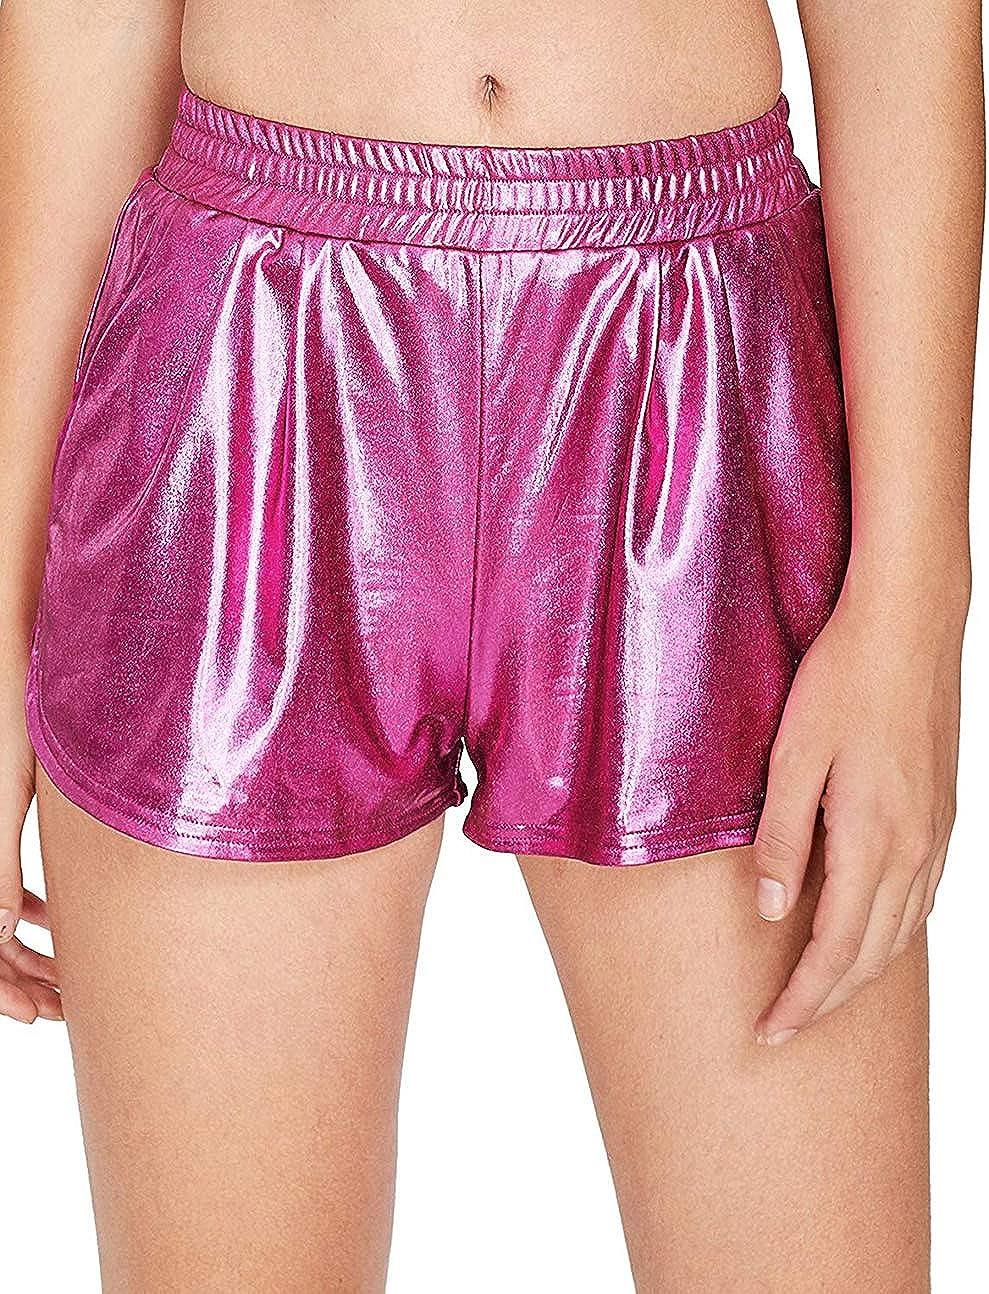 Women's Metallic Shorts Shiny Pants Yoga Sparkly Hot Drawstring Outfit Elastic Waist Rave Booty Dance